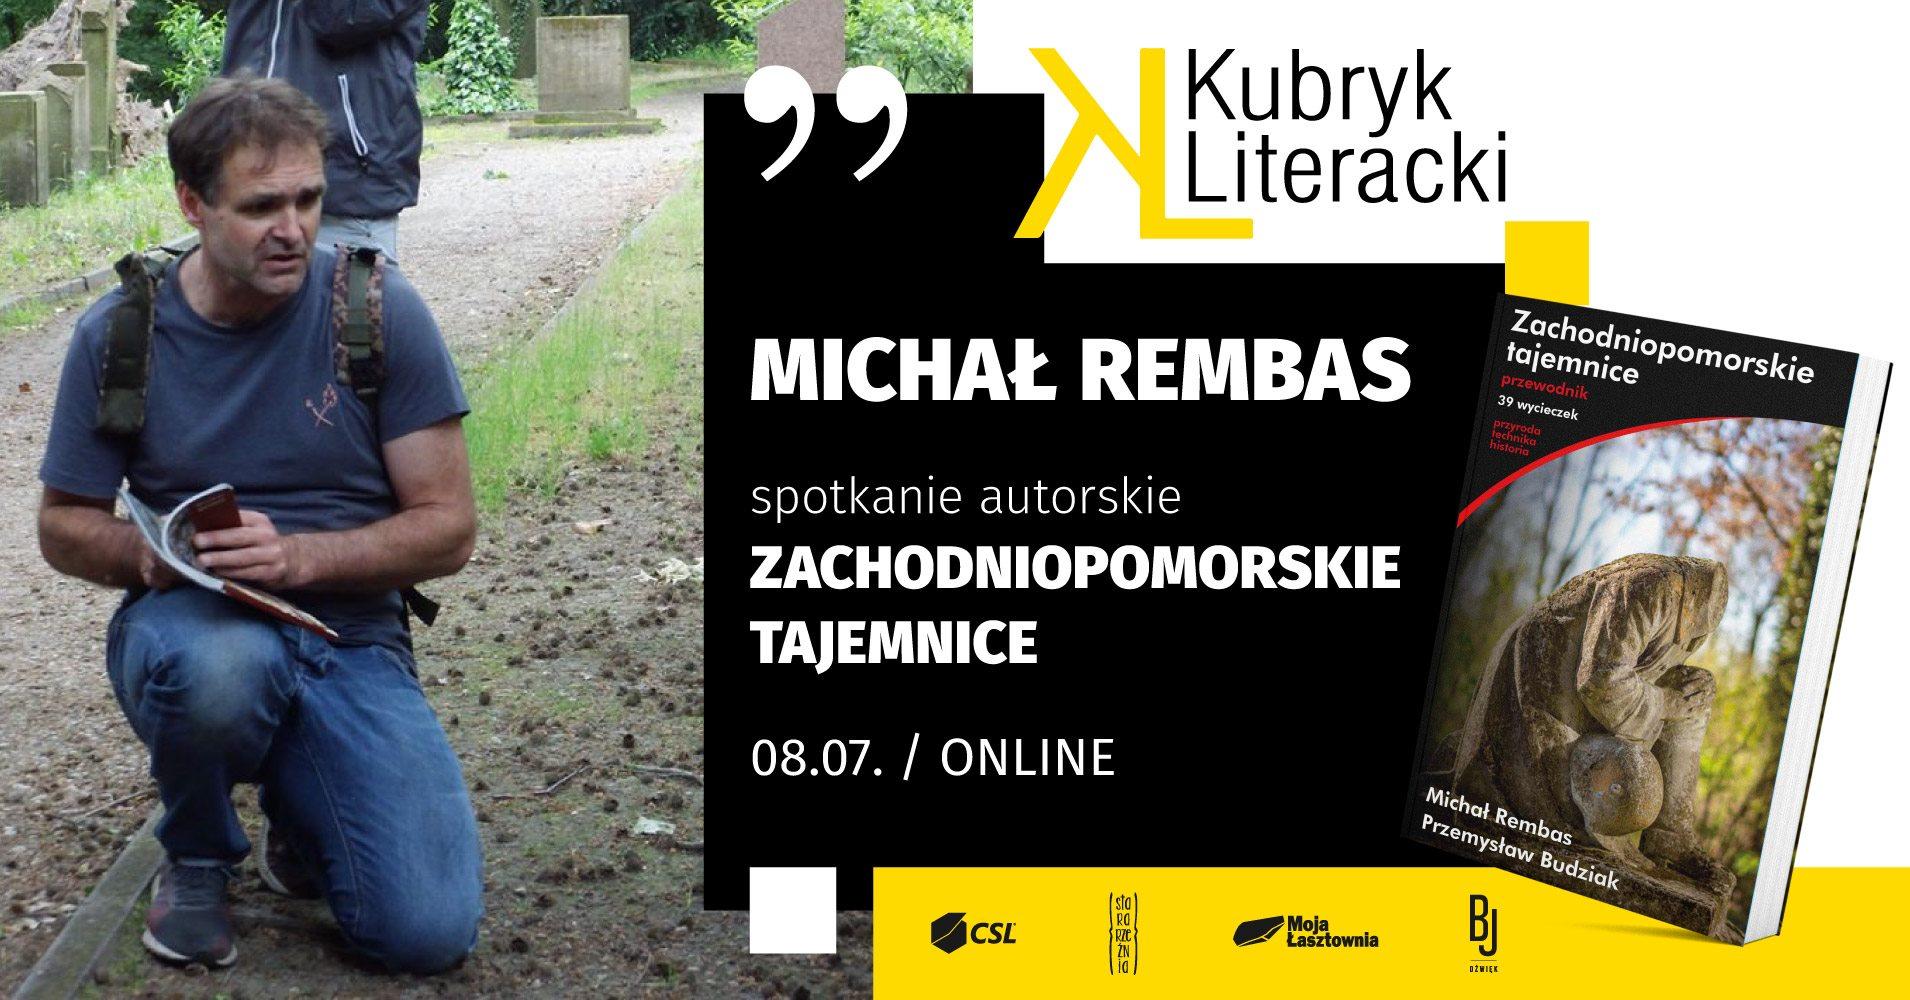 Kubryk Literacki - online